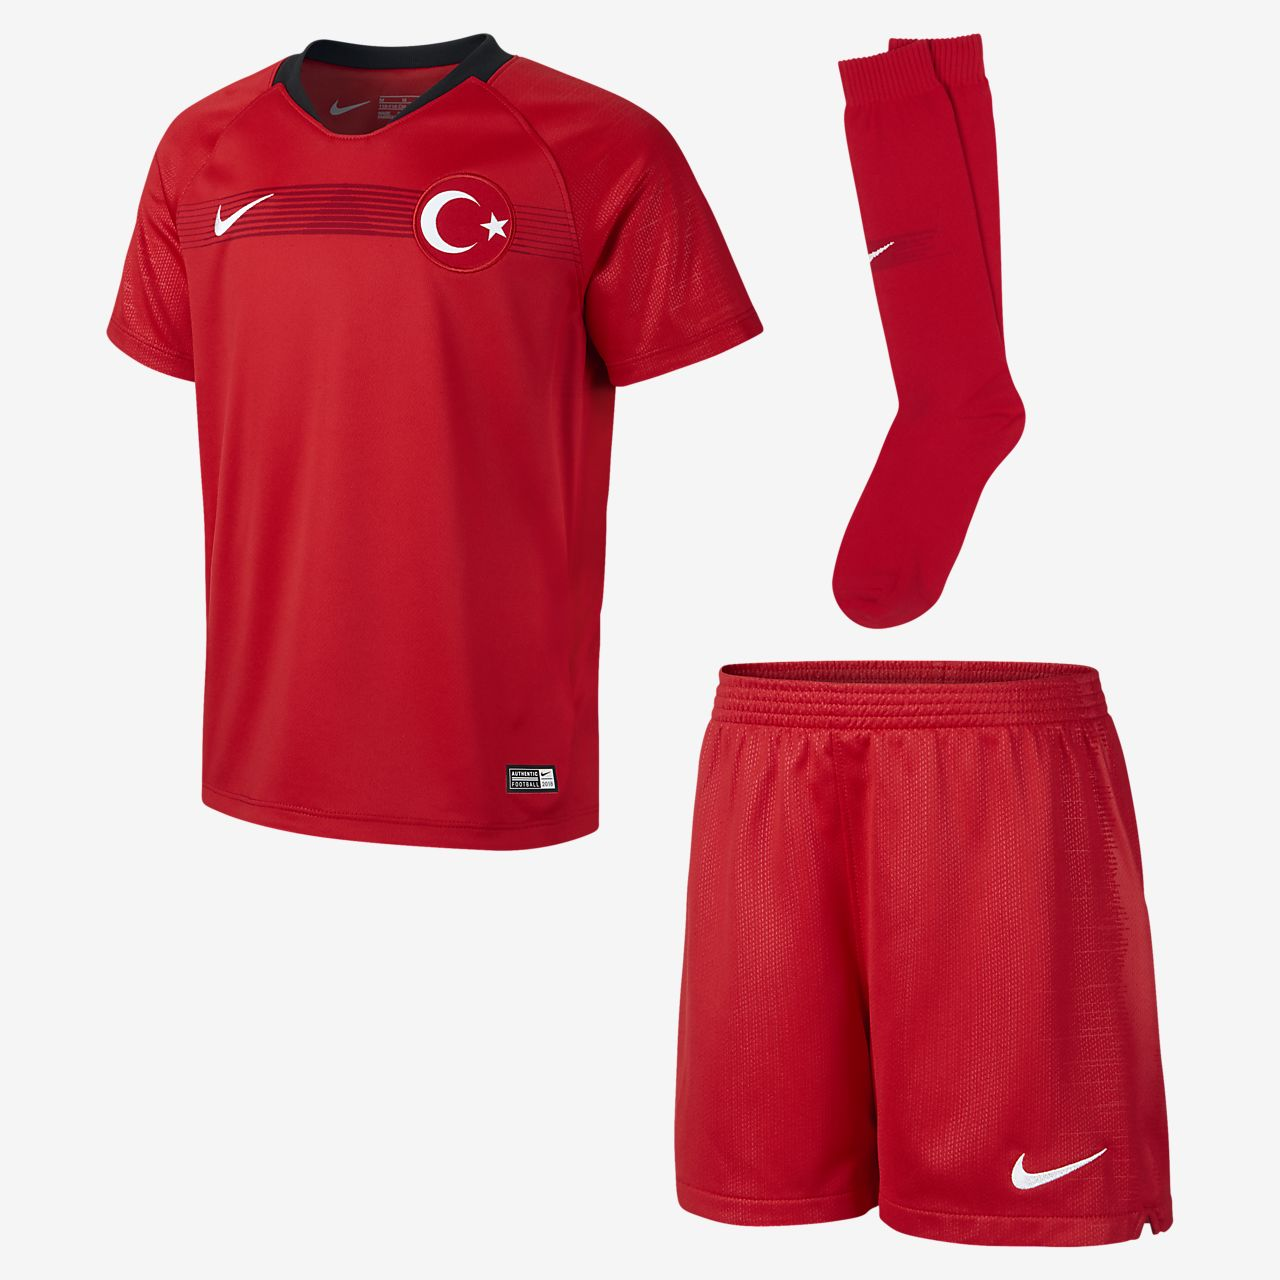 448e7cef444 ... Uniforme de fútbol para niños talla pequeña 2018 Turkey Stadium Home